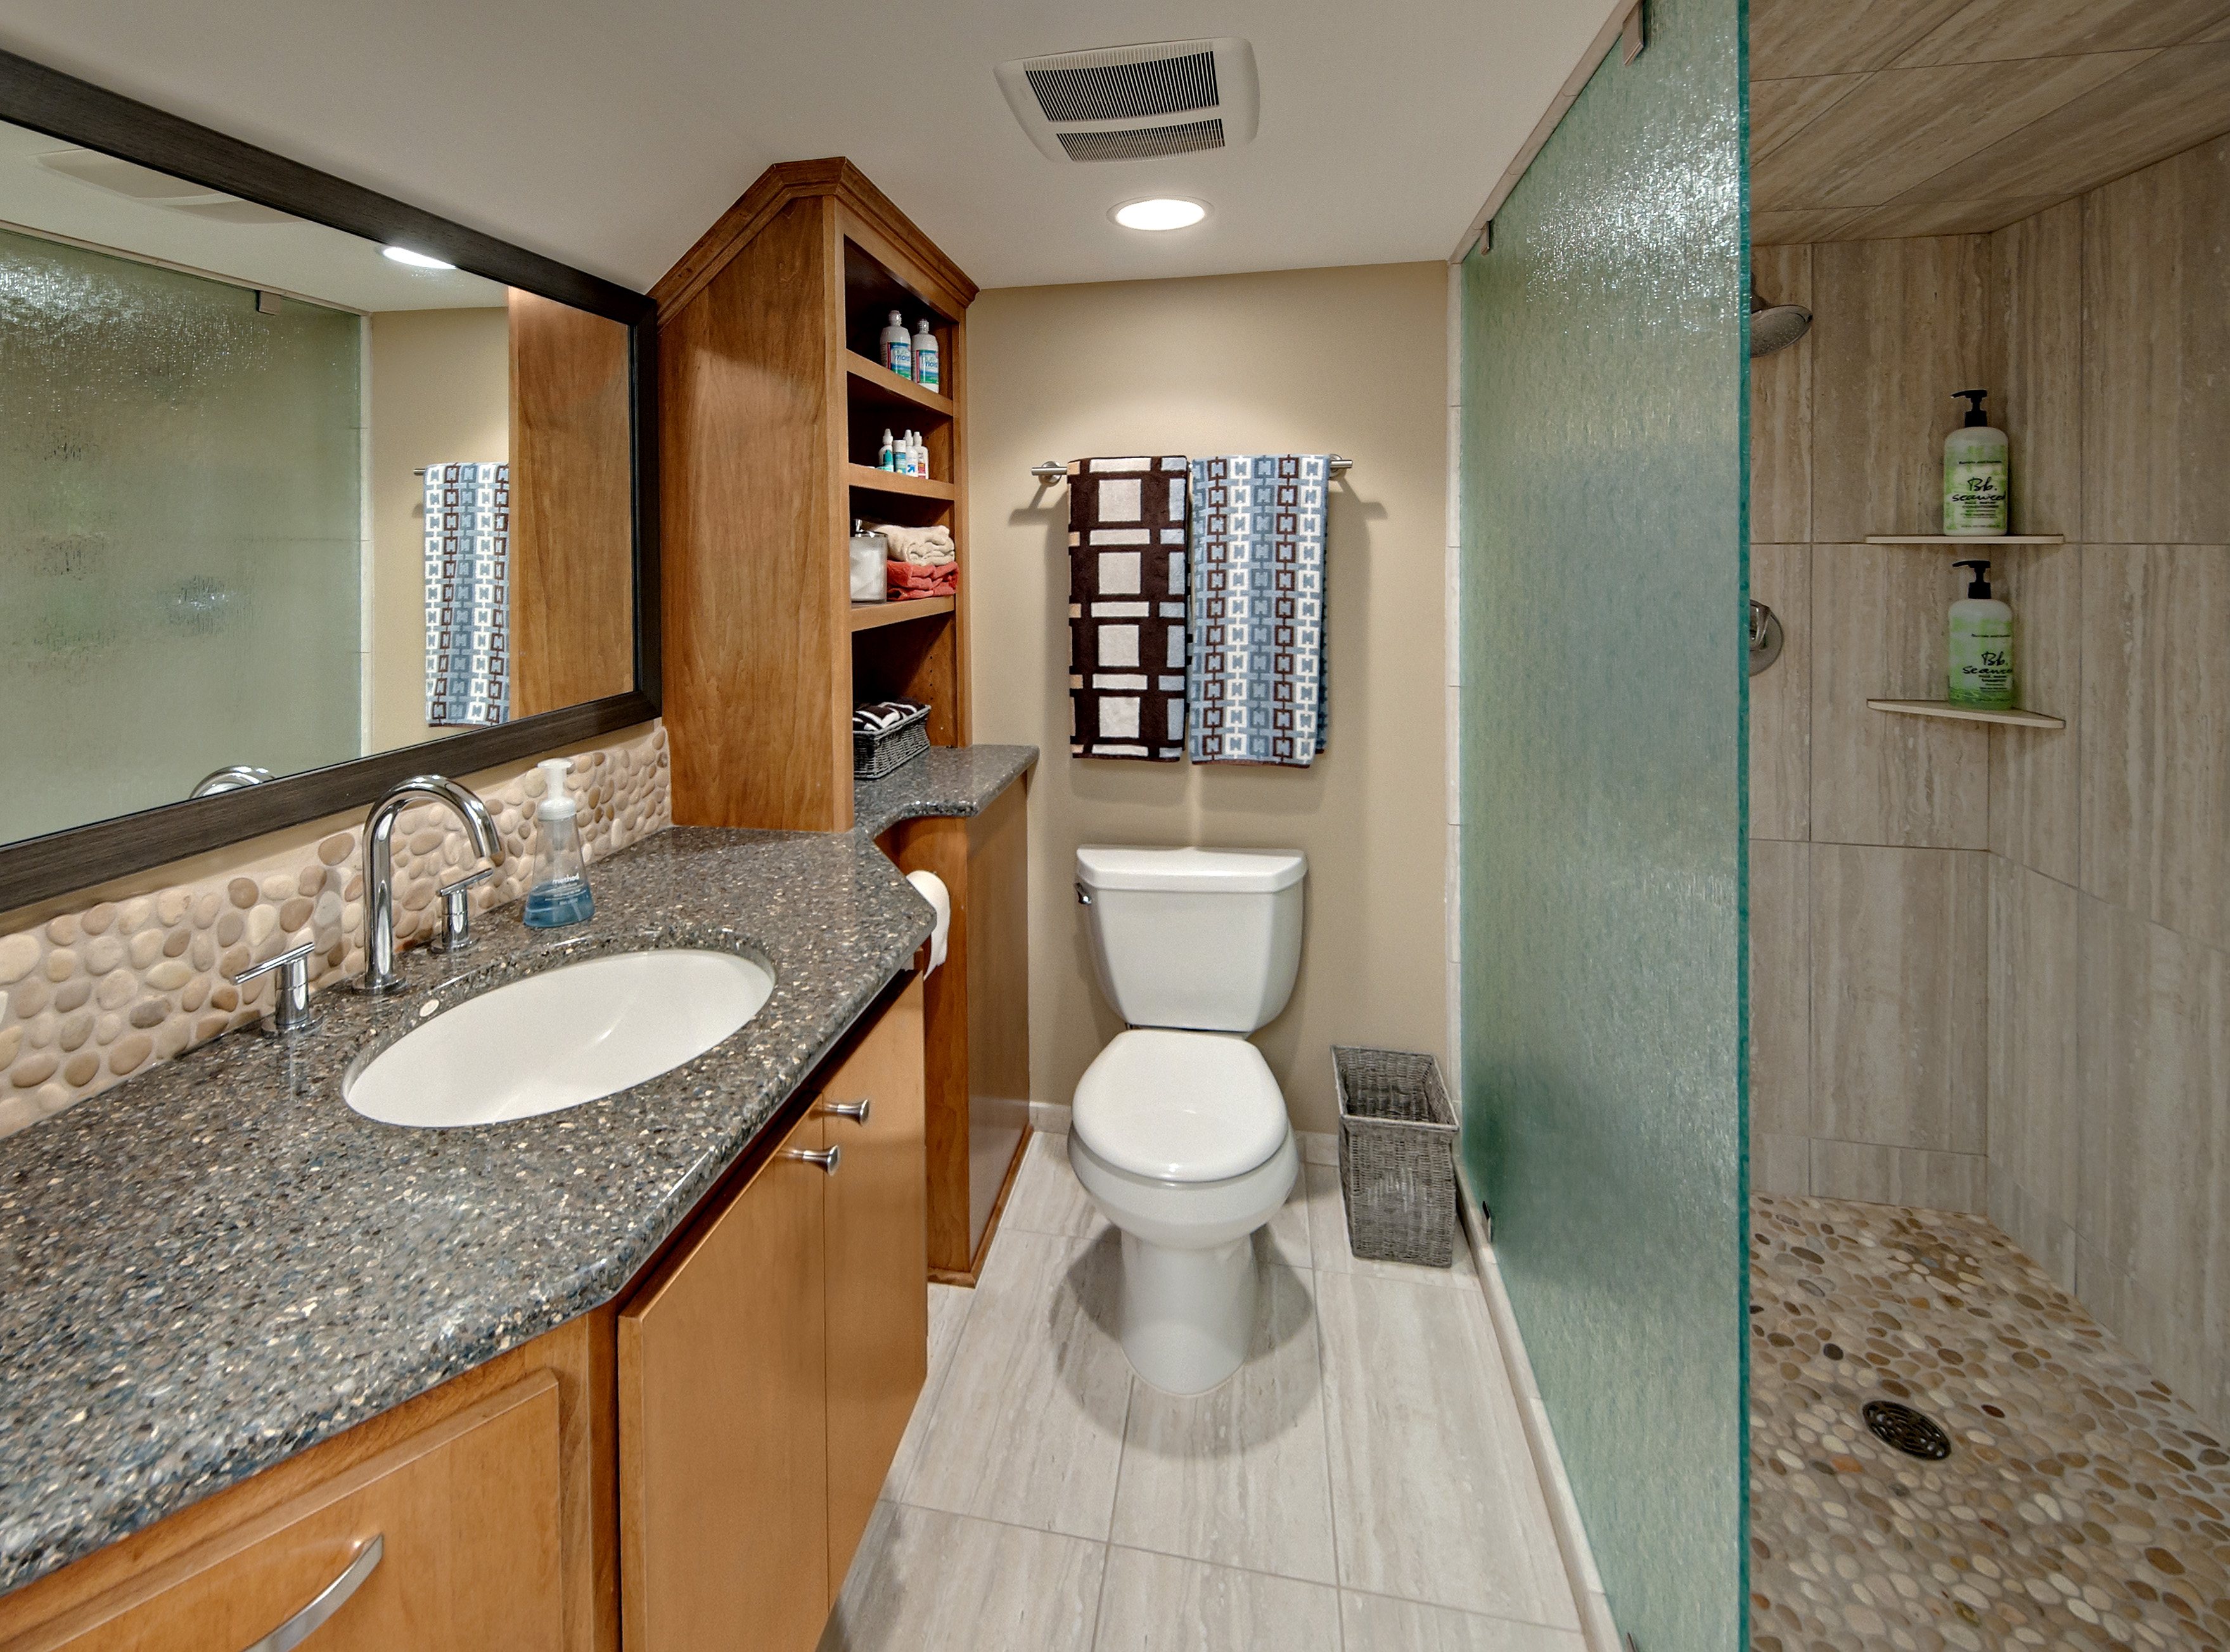 mbros kitchen and bathroom remodeling North suburban bathroom insurance restoration